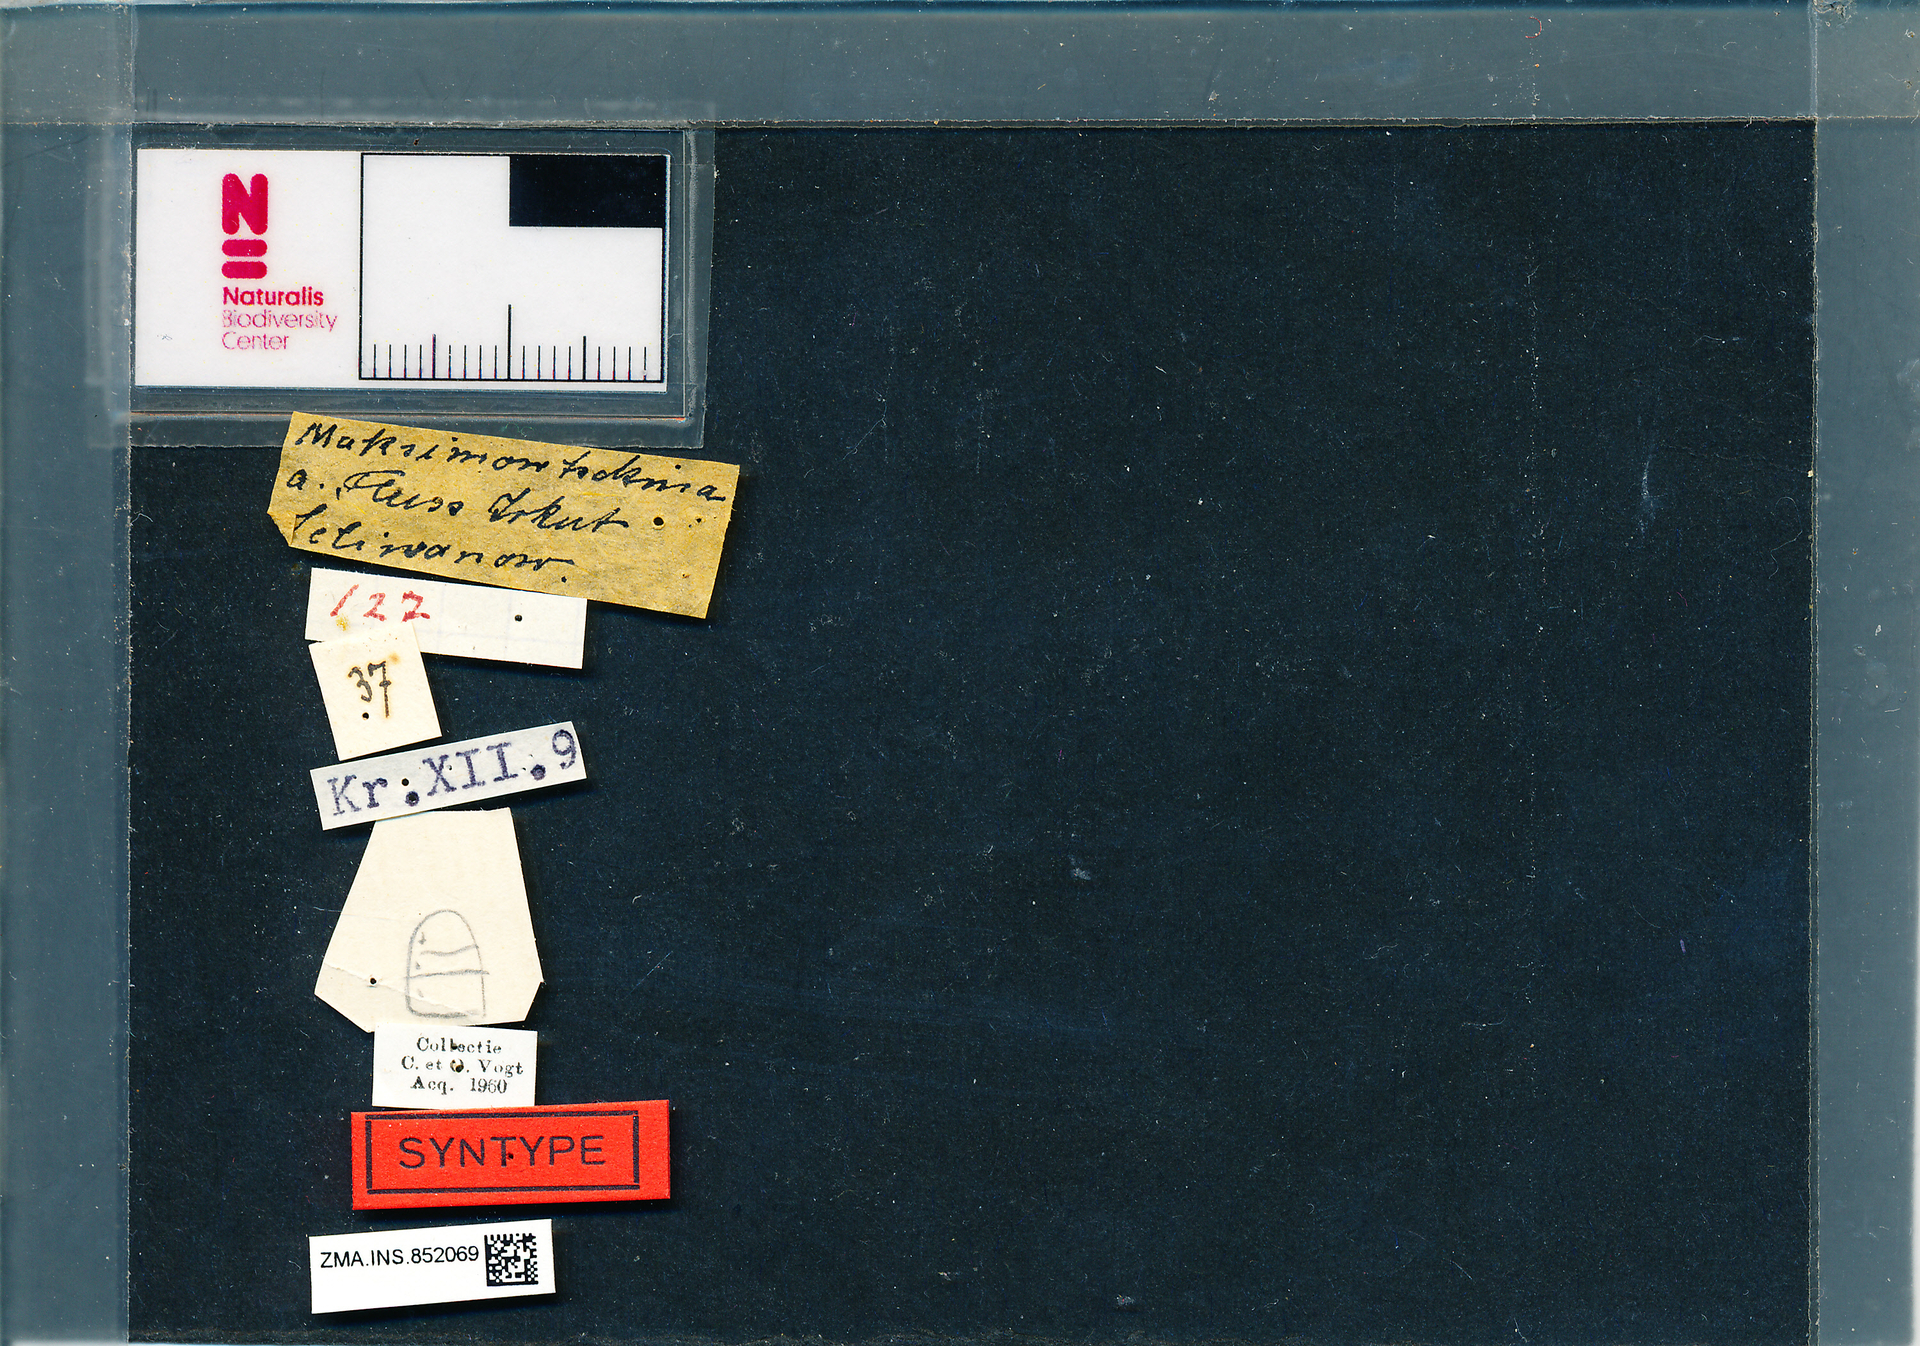 ZMA.INS.852069 | Bombus (Psithyrus) rupestris orientalis Reinig, 1936